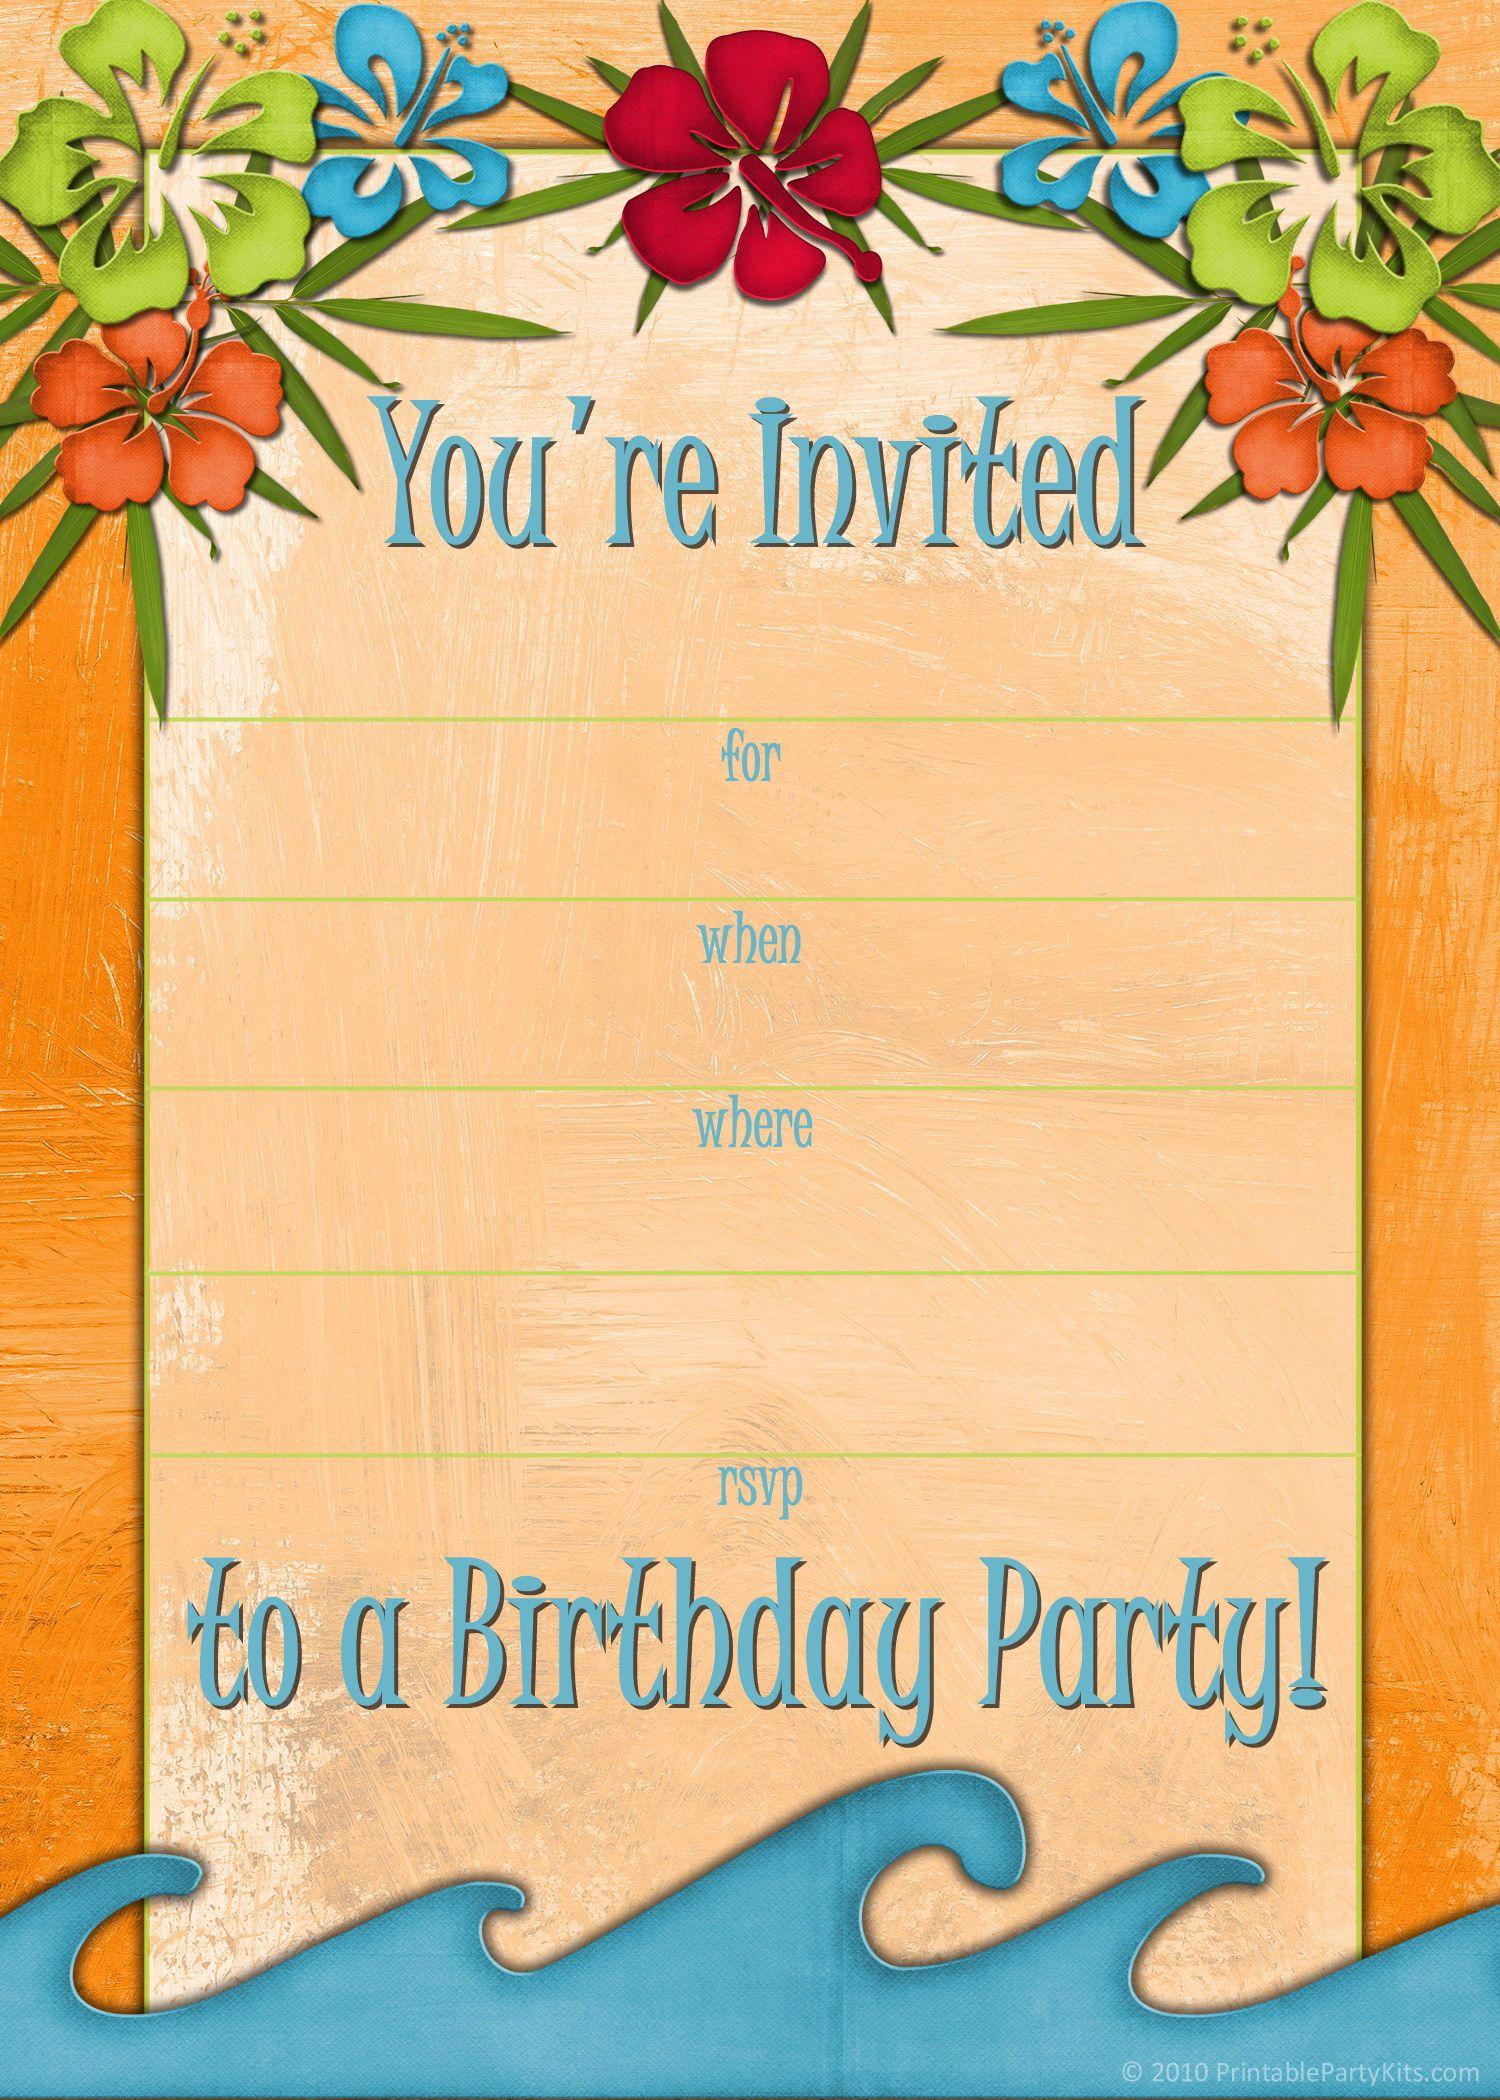 Free Printable Beach Party, Luau And Bbq Invitations Templates - Free Printable Beach Pictures